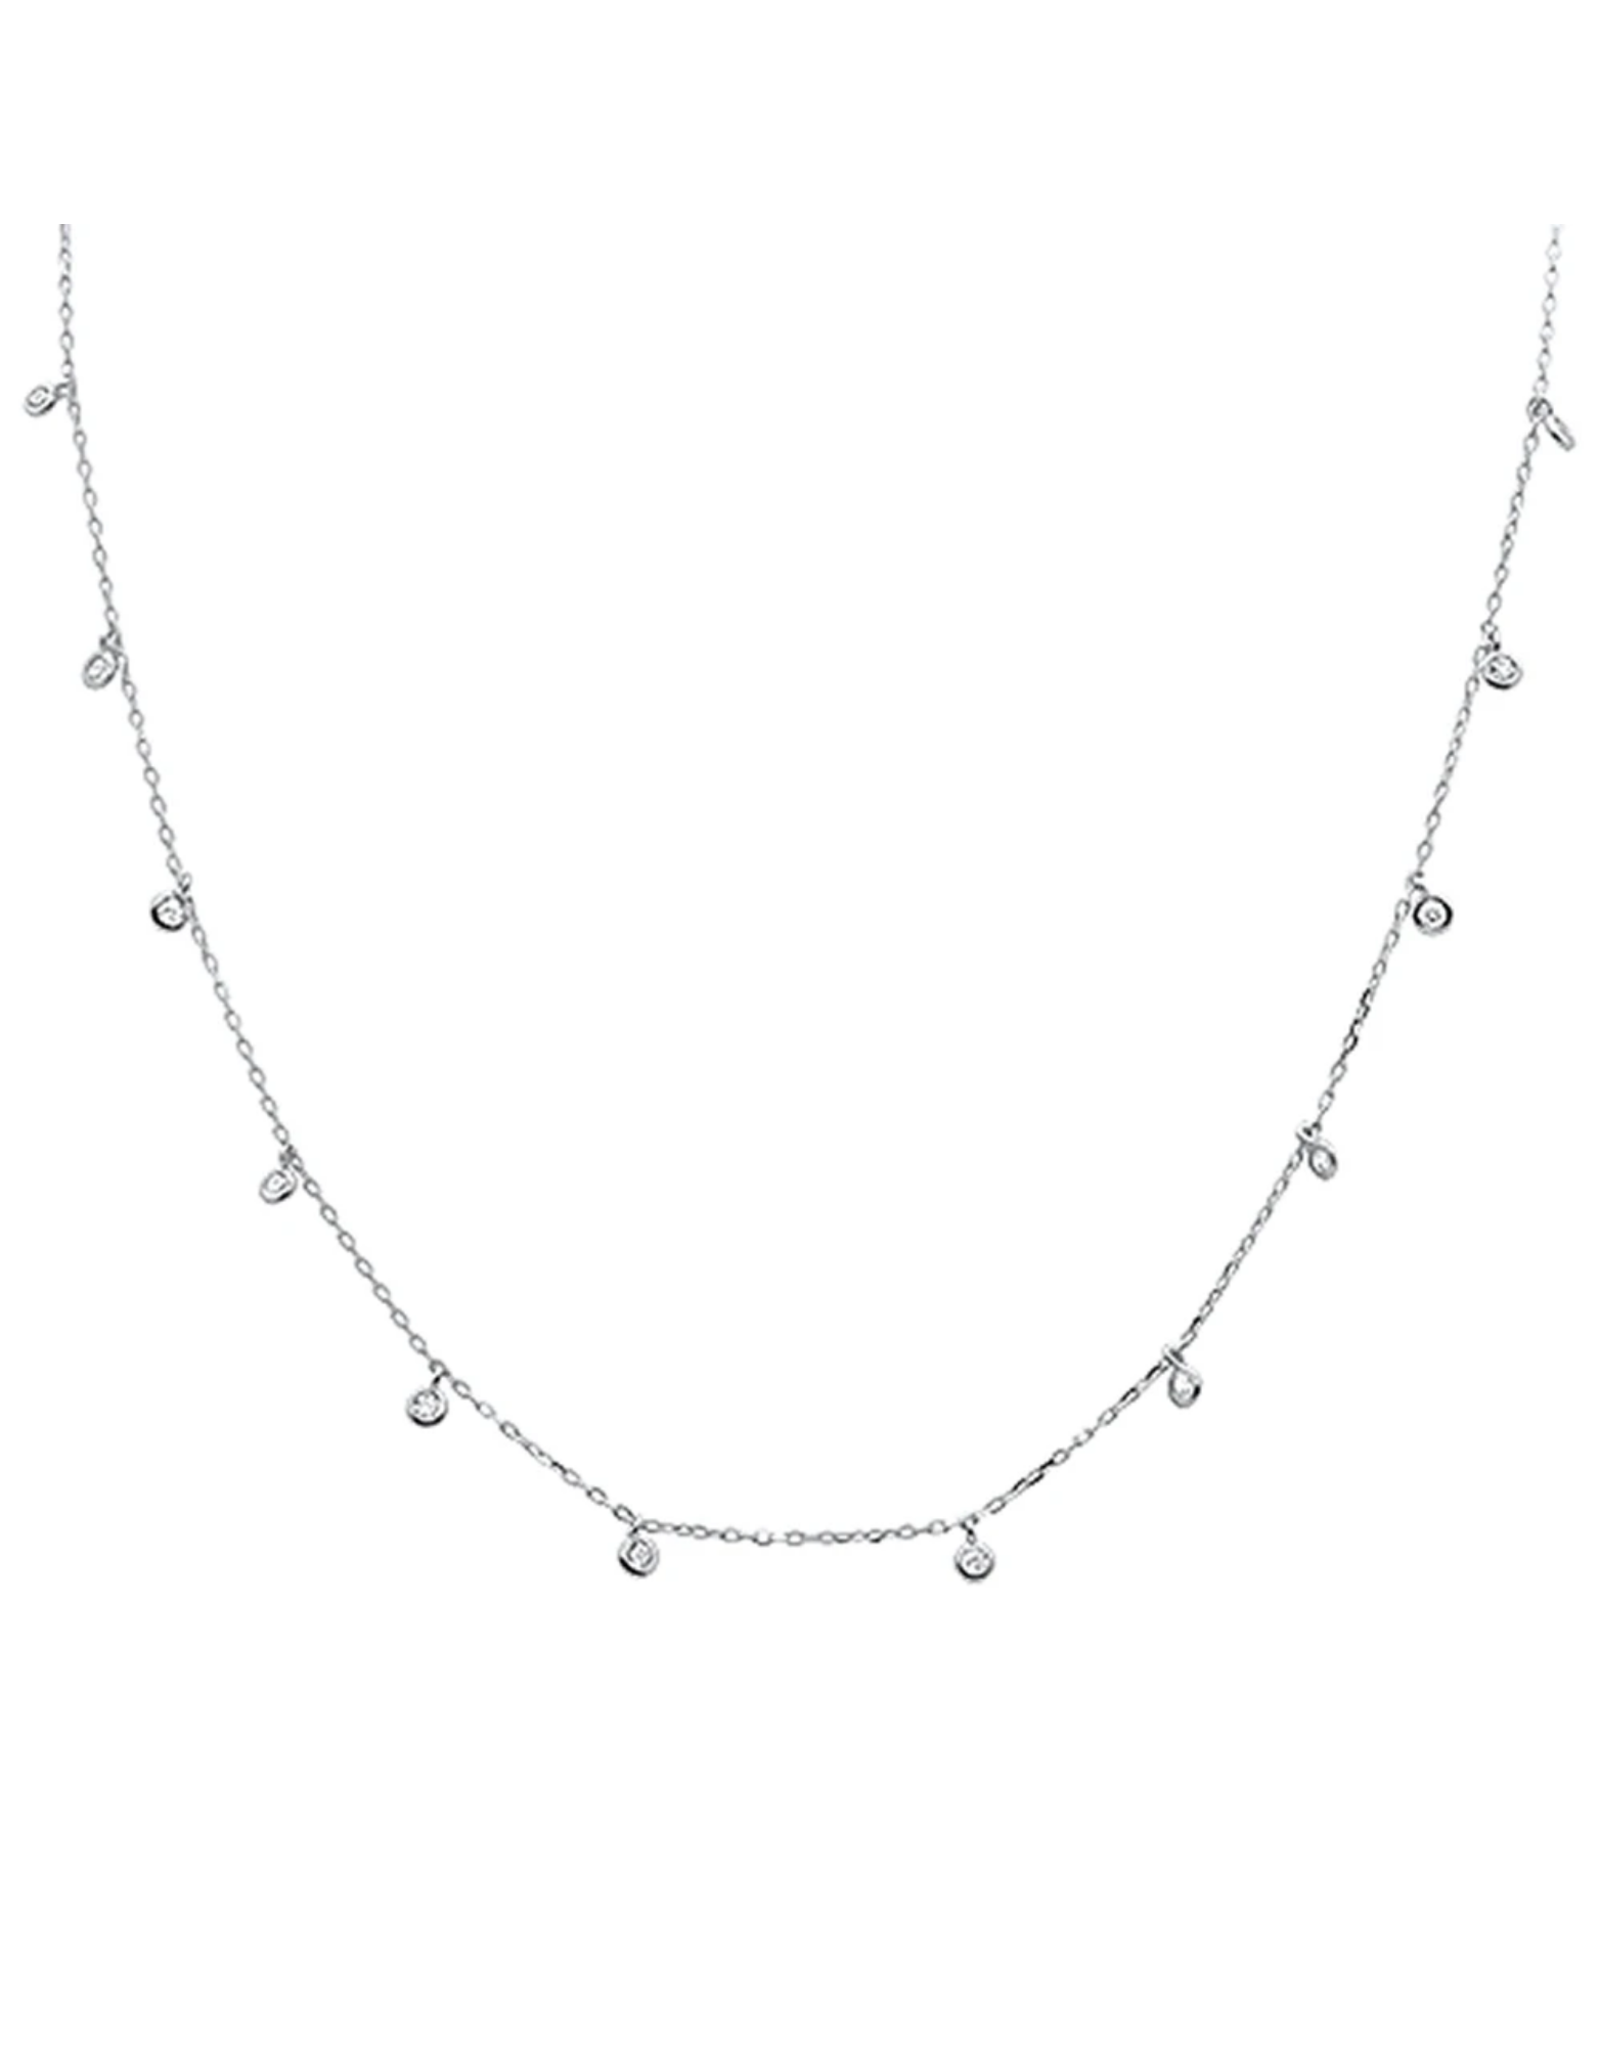 Sonara Jewelry Sterling Multi Bezel CZ Necklace